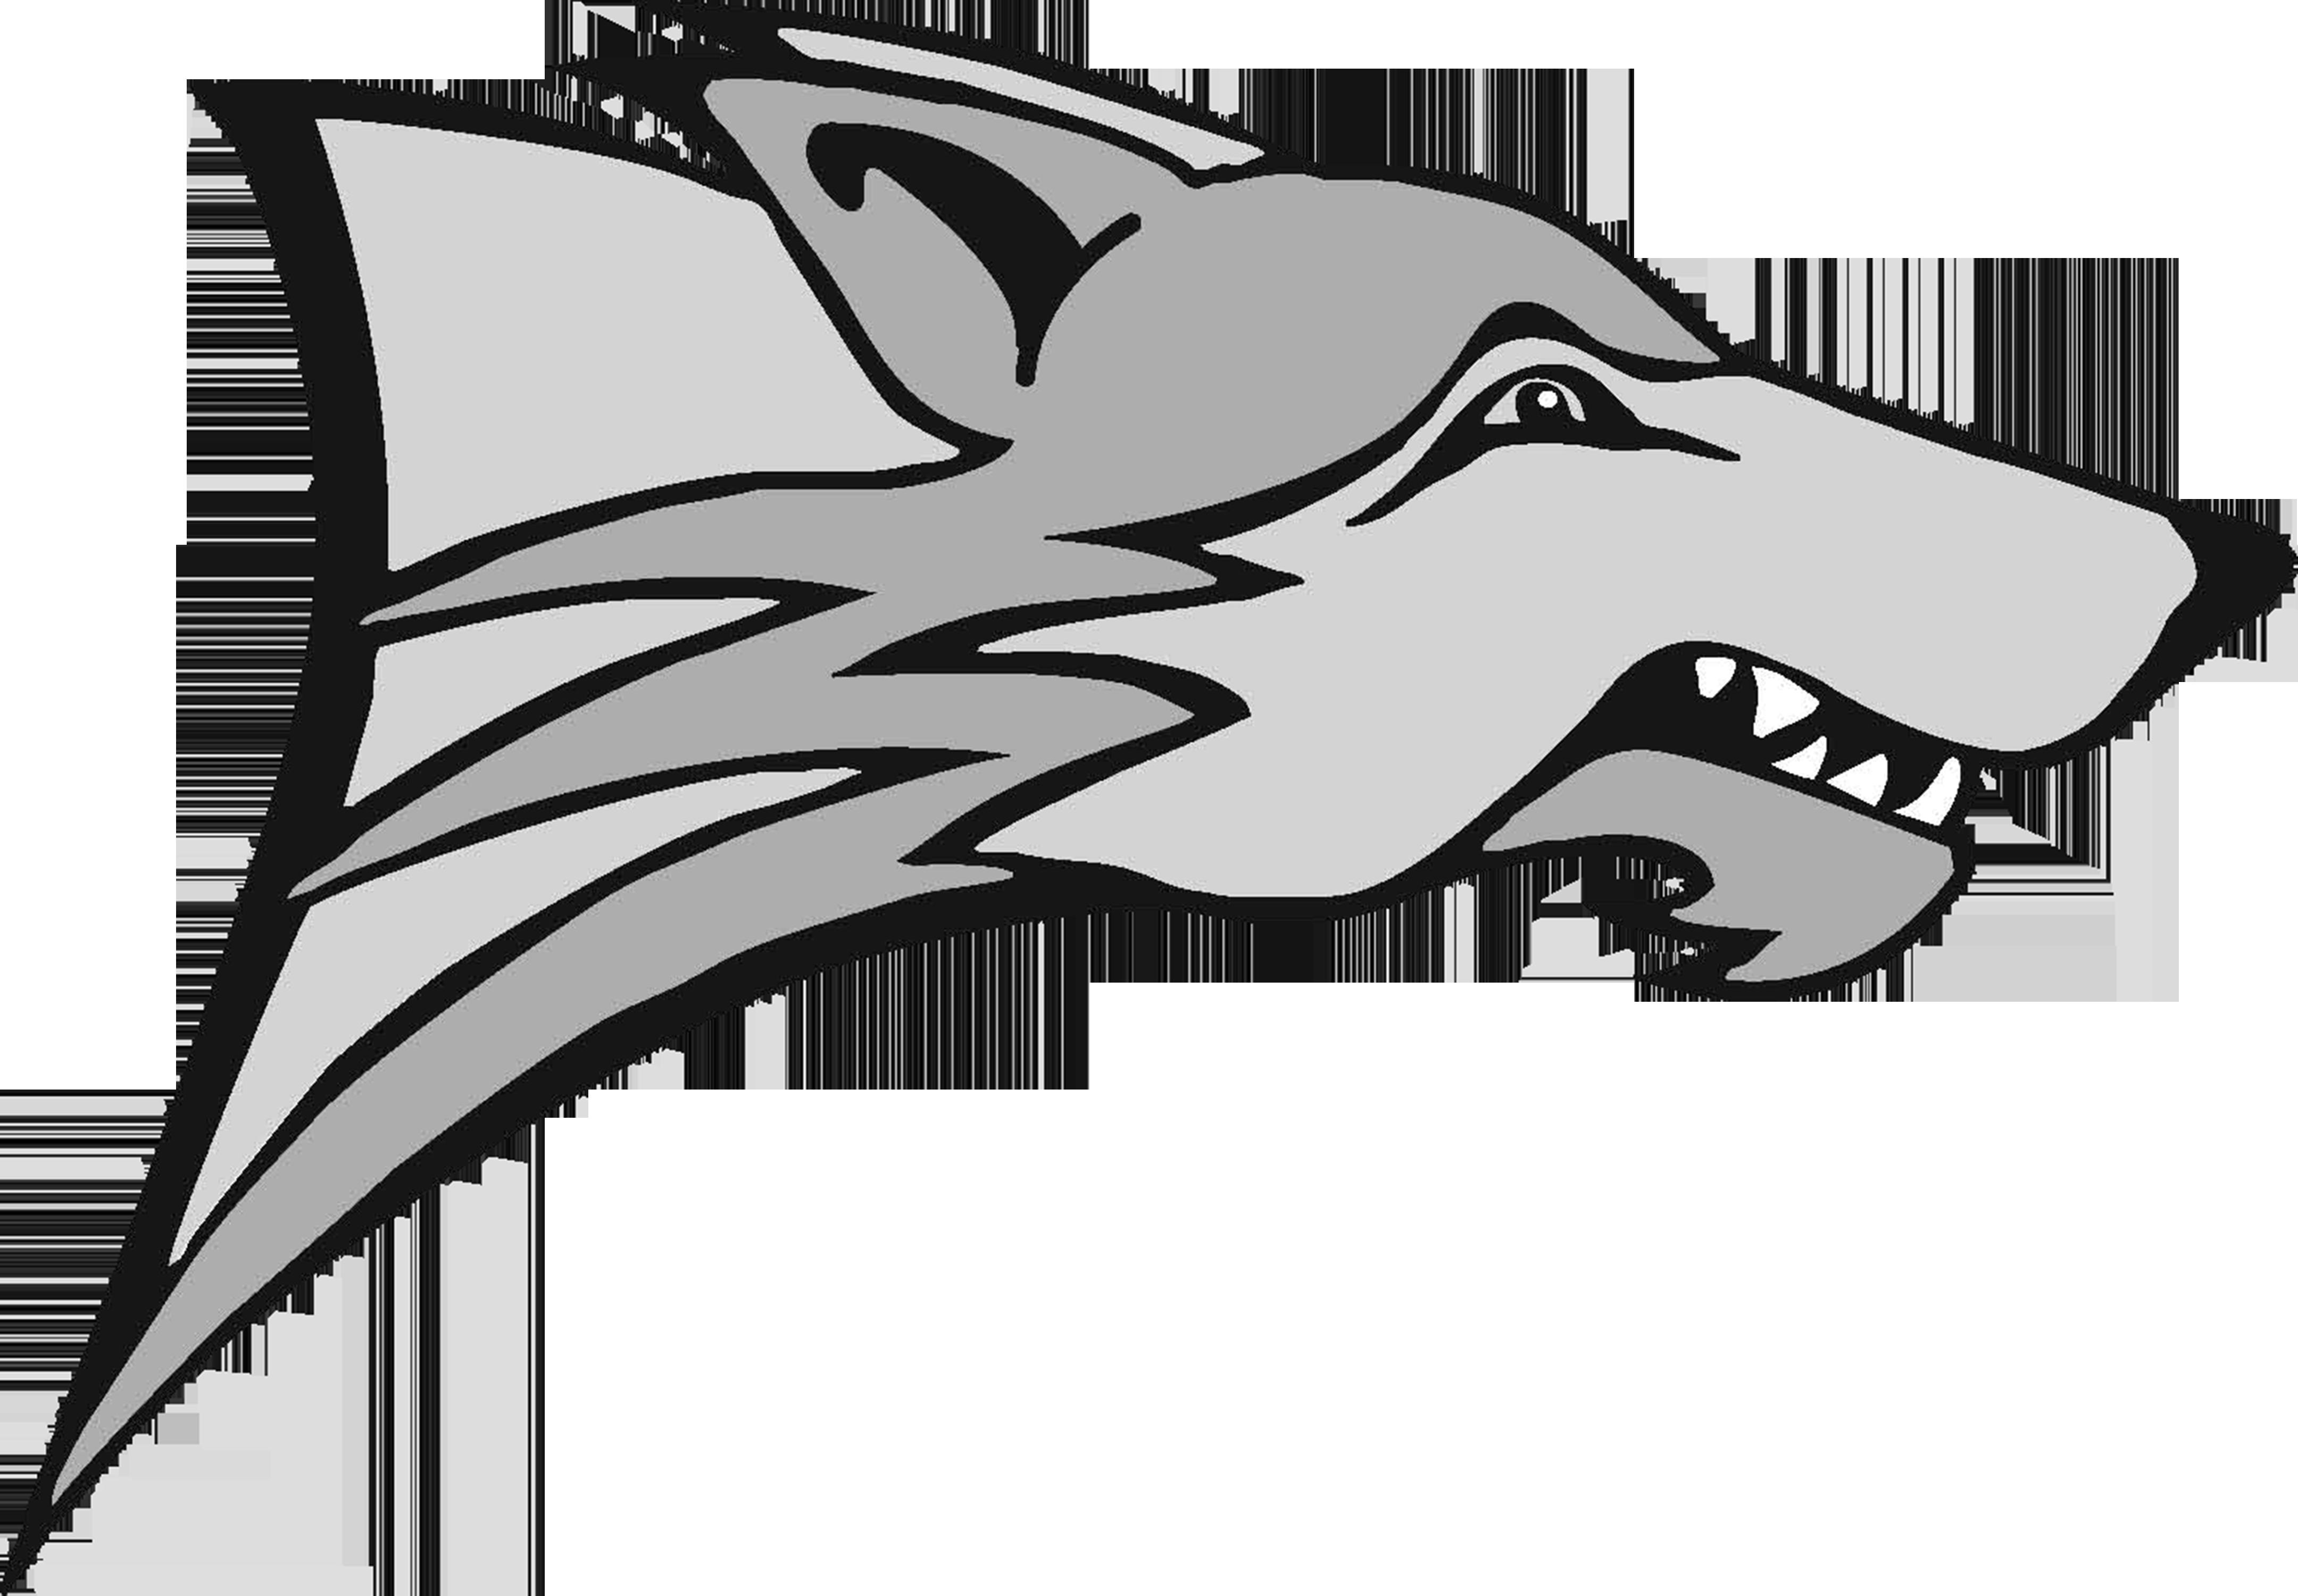 The Pinnacle Timberwolves Scorestream